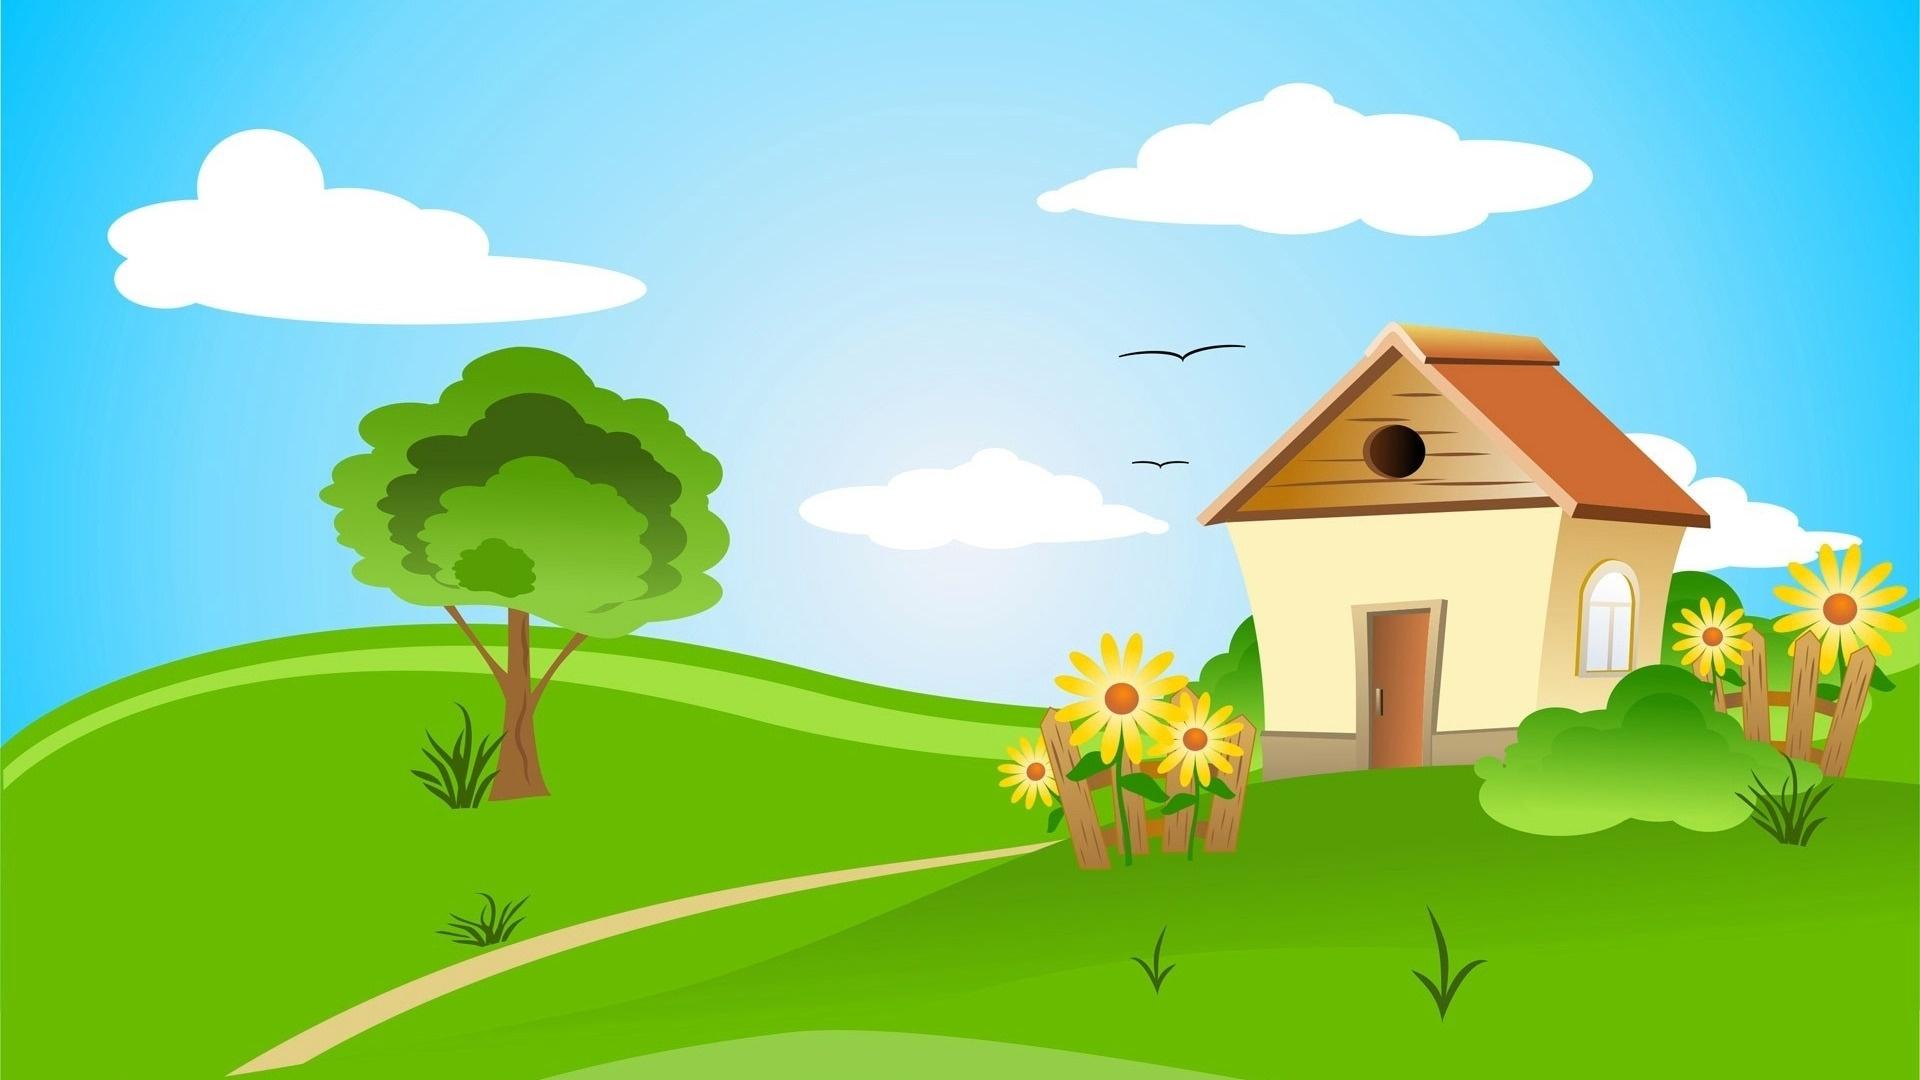 Village House Art desktop wallpaper hd